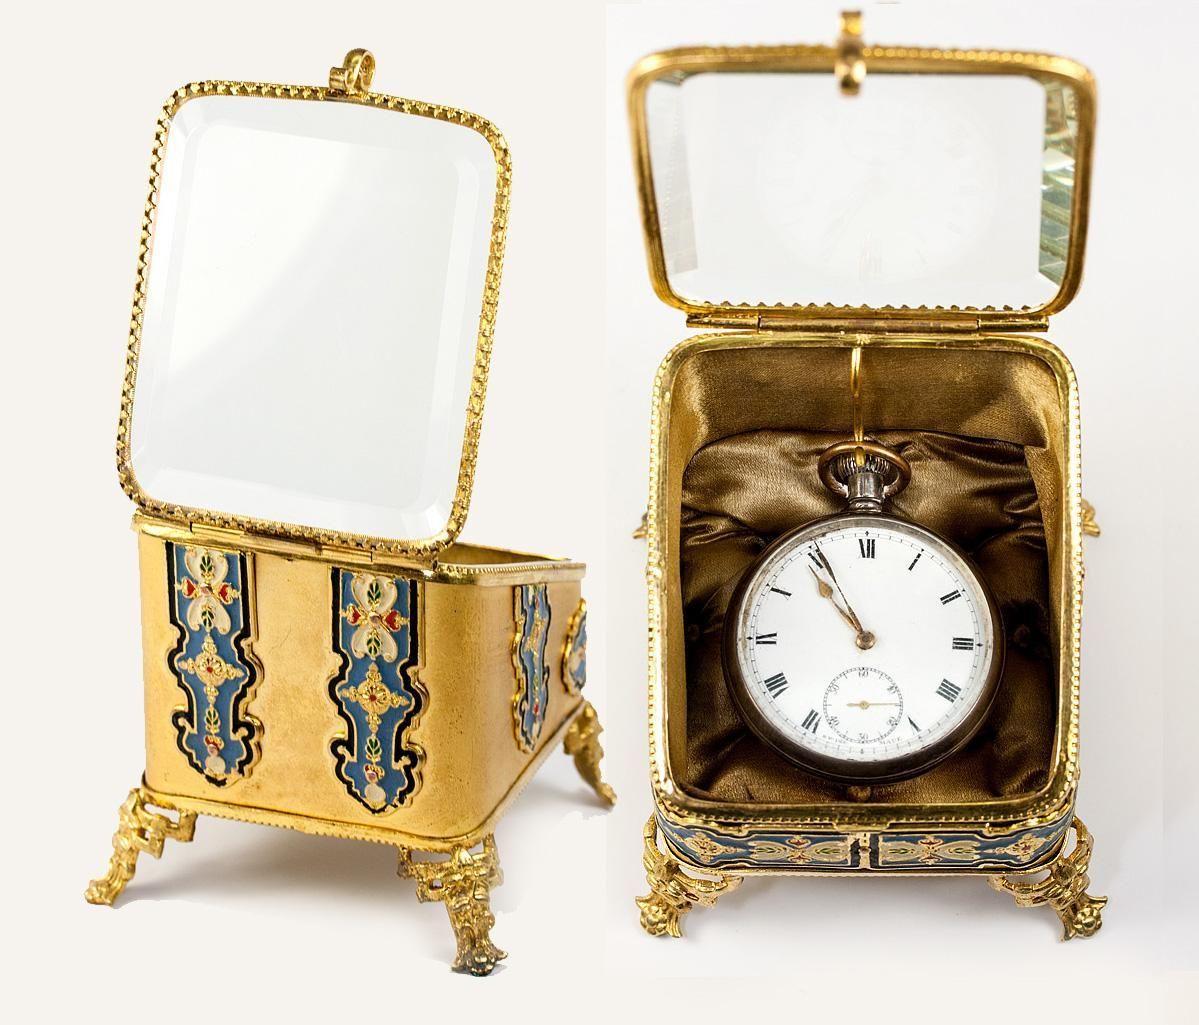 Antique French Pocket Watch Box, Jewelry Casket with Kiln-fired Enamel, Beveled Glass